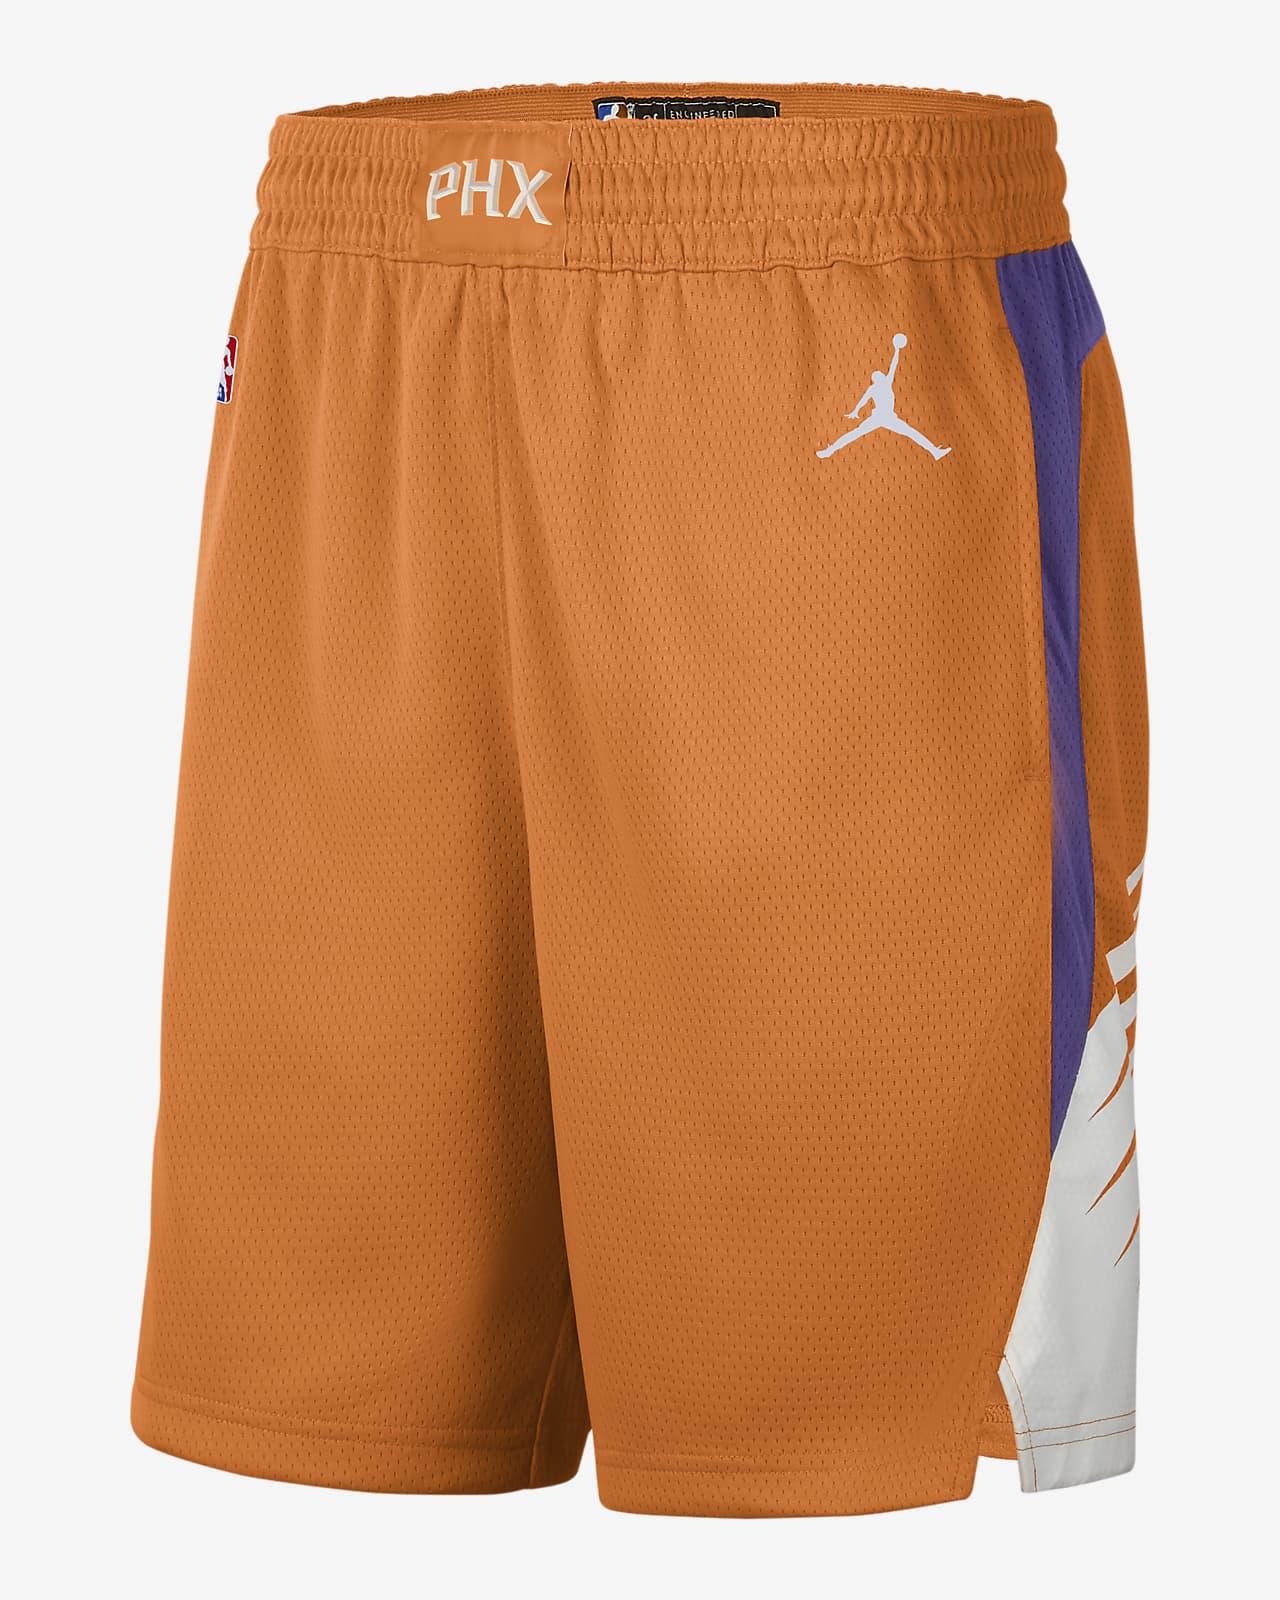 Suns Statement Edition 2020 Men's Jordan NBA Swingman Shorts